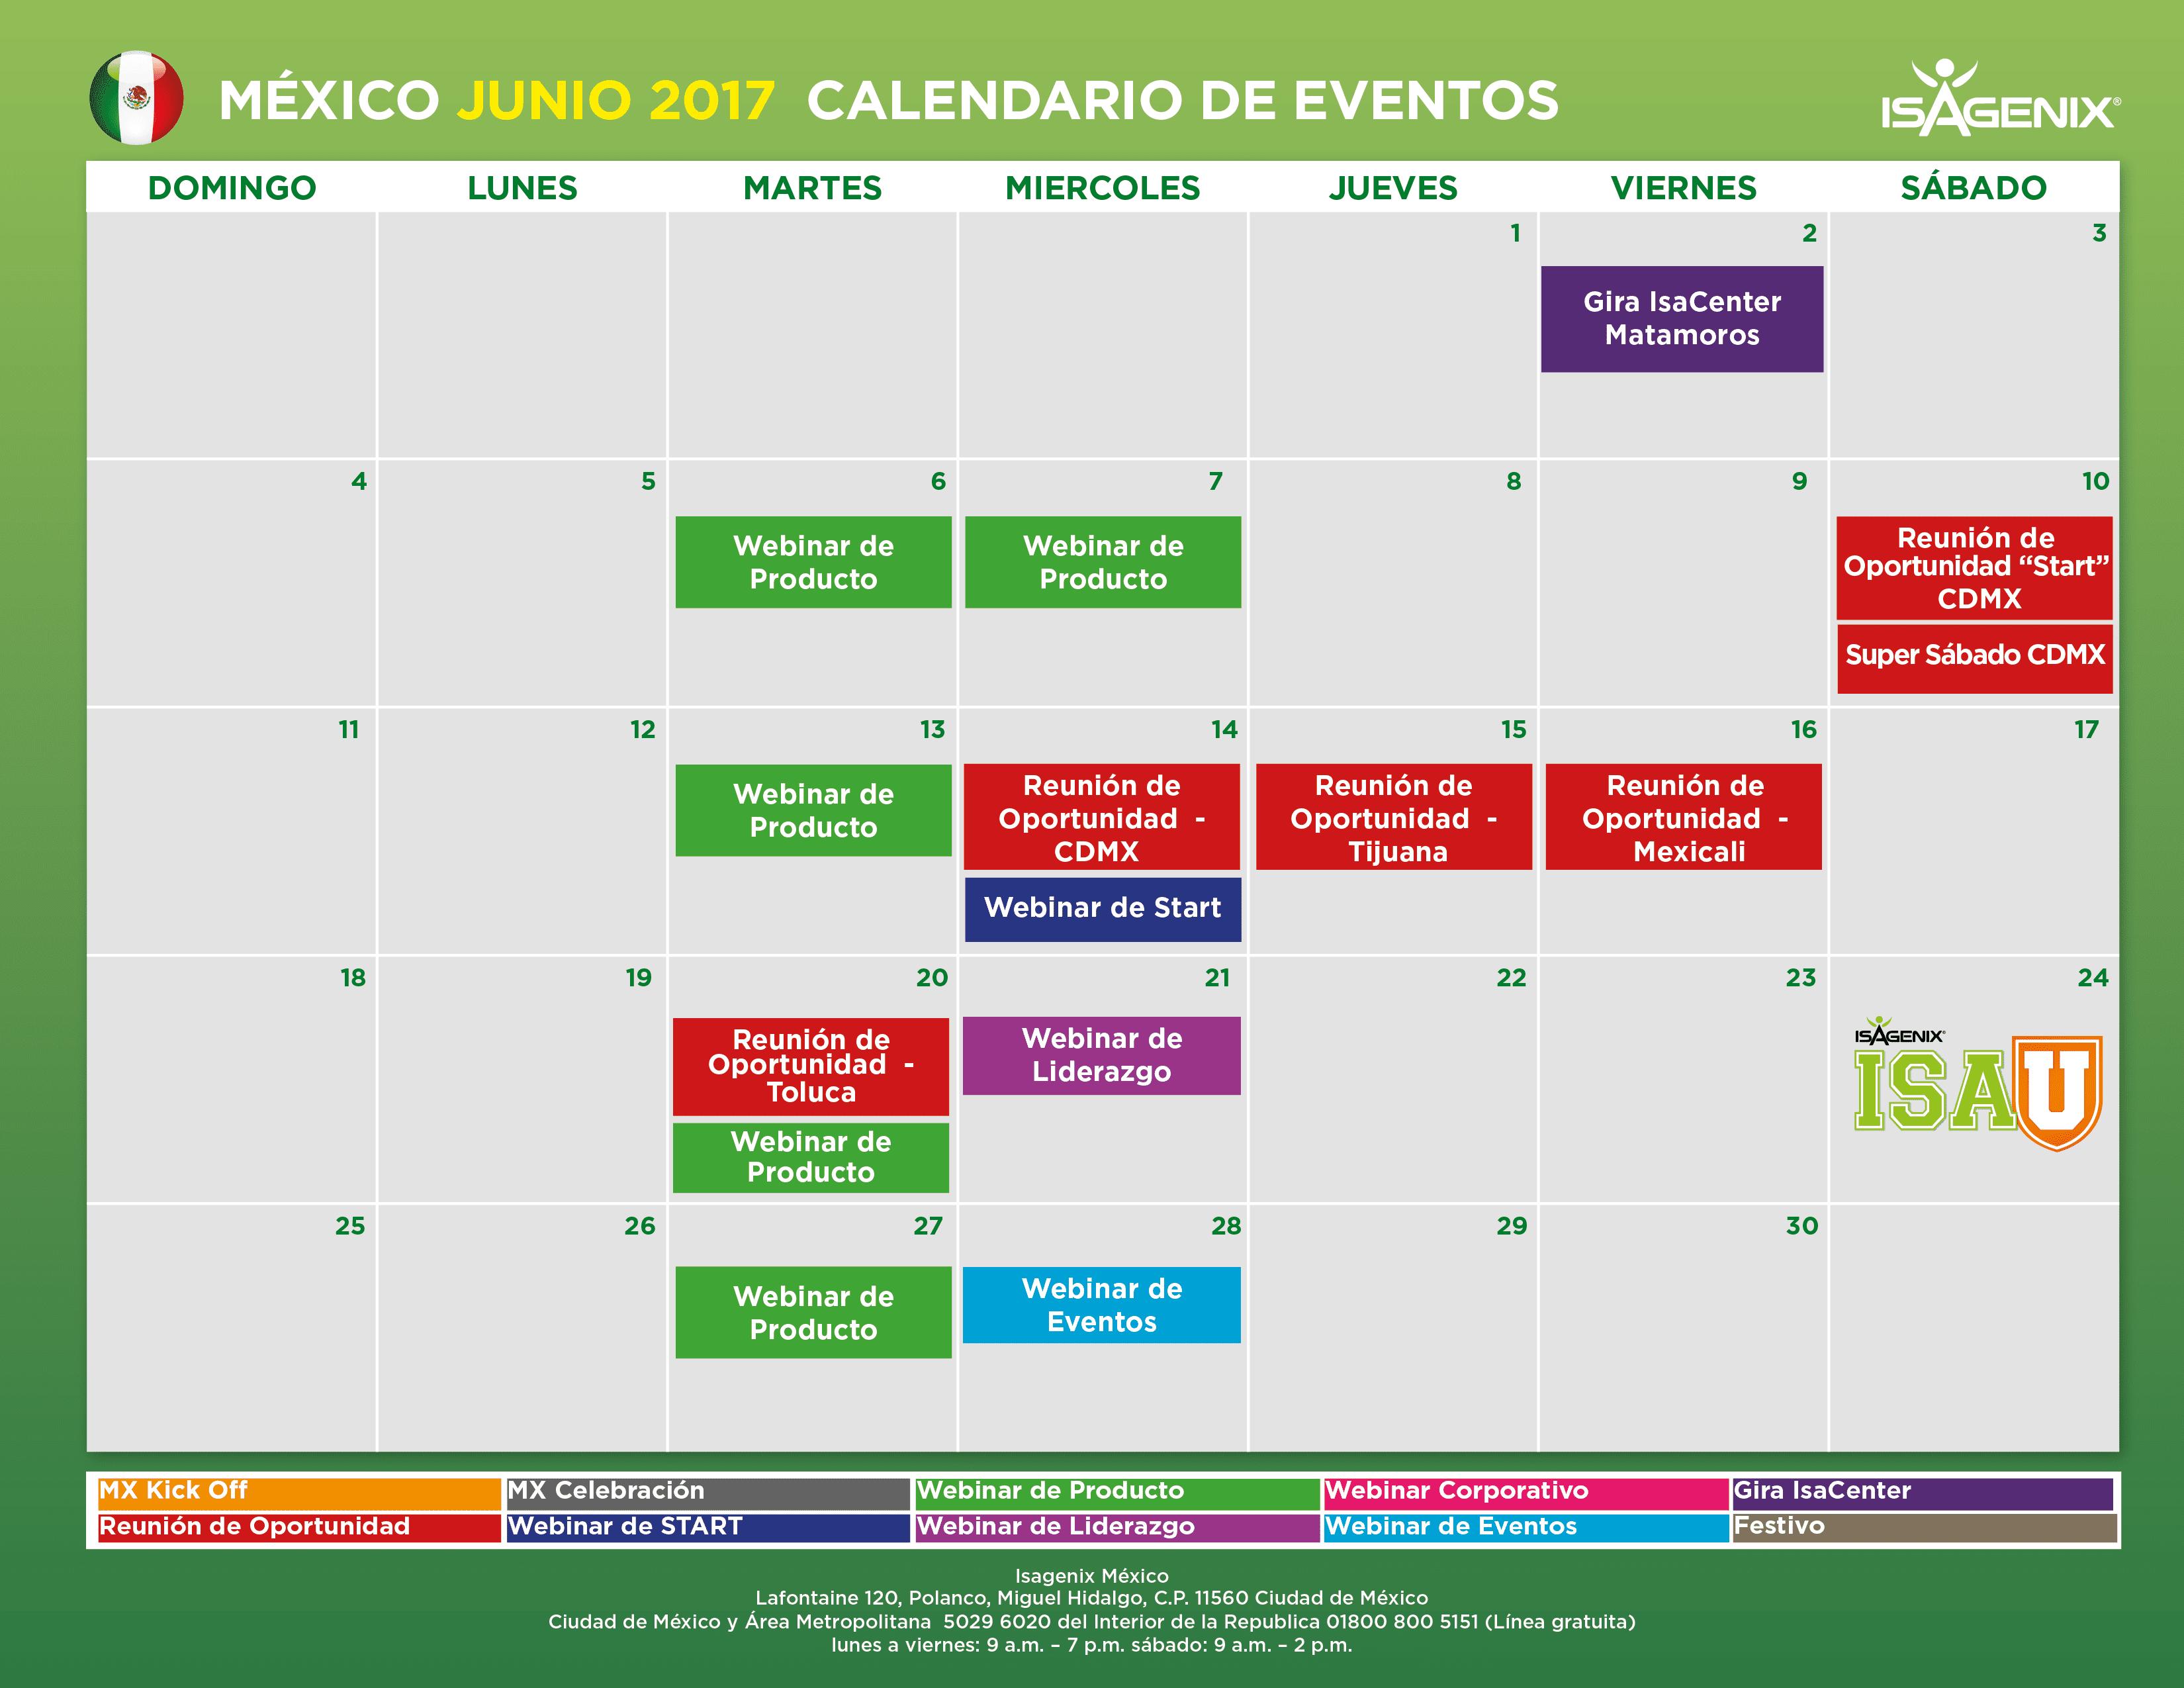 calendario-mexico-junio-2017-01